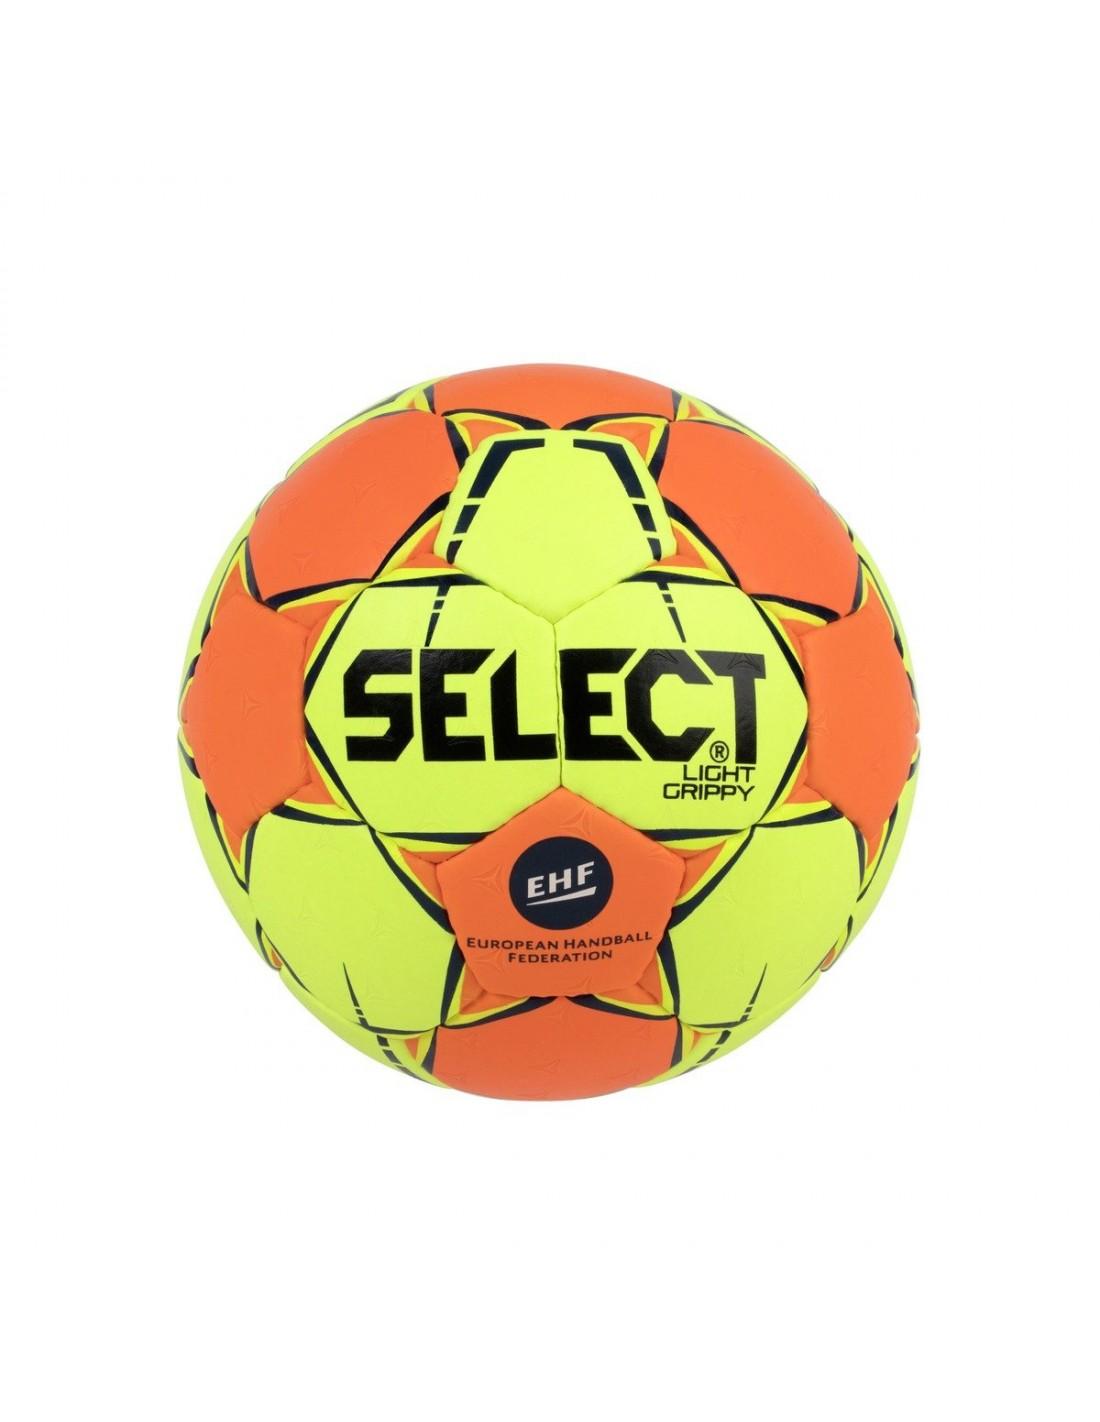 Håndballer Select Håndball Light Grippy 230008 199 kr